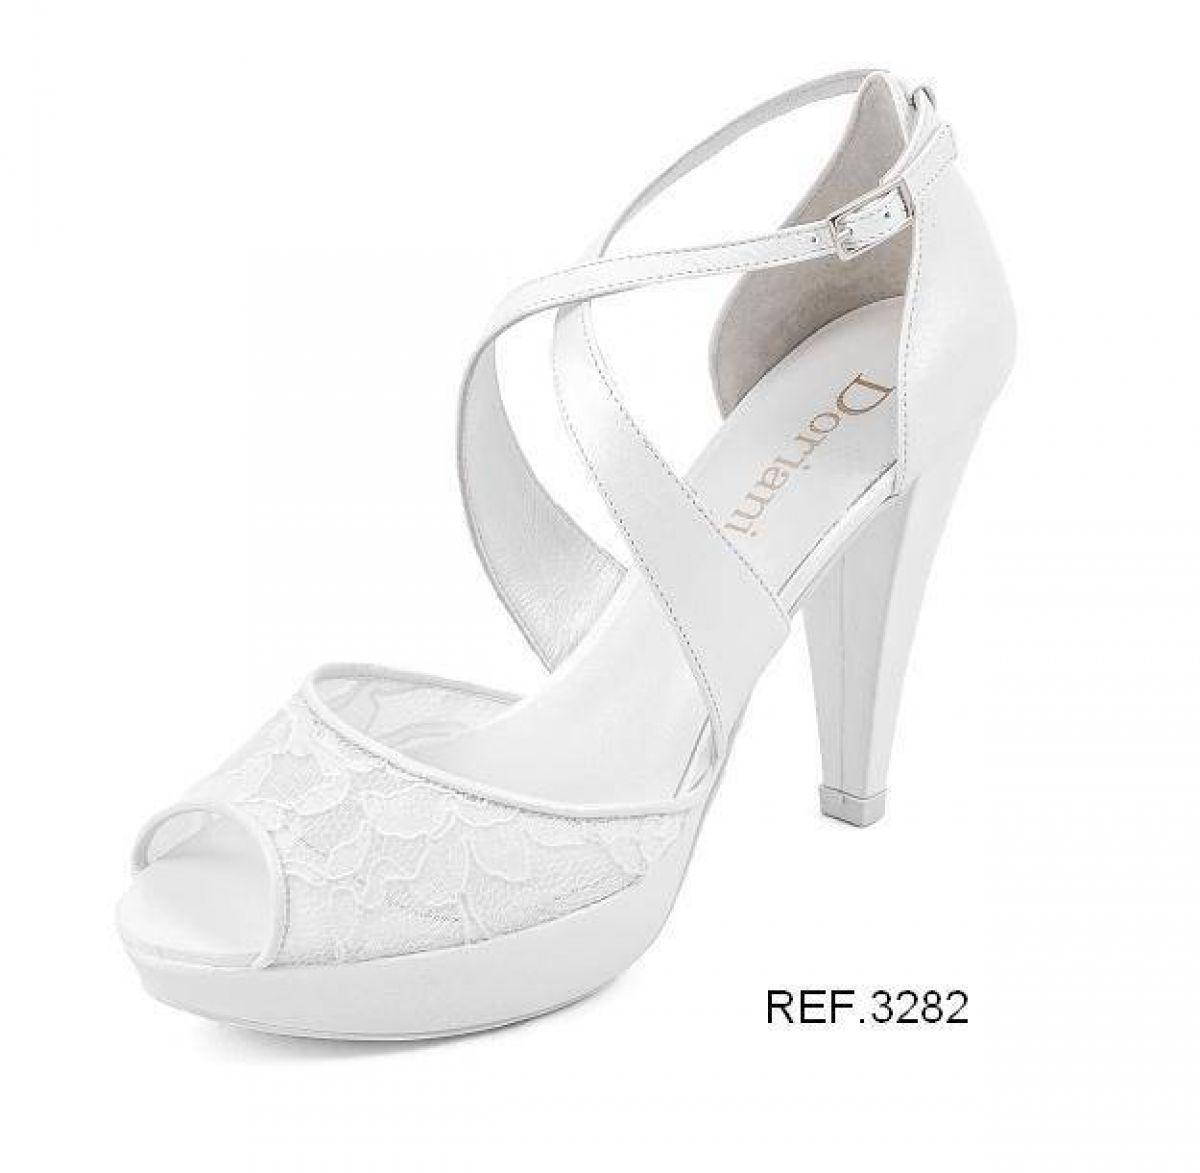 5cff3c6f Doriani Zapatos Zapatos Novia Novia Baratos N8vmwOn0